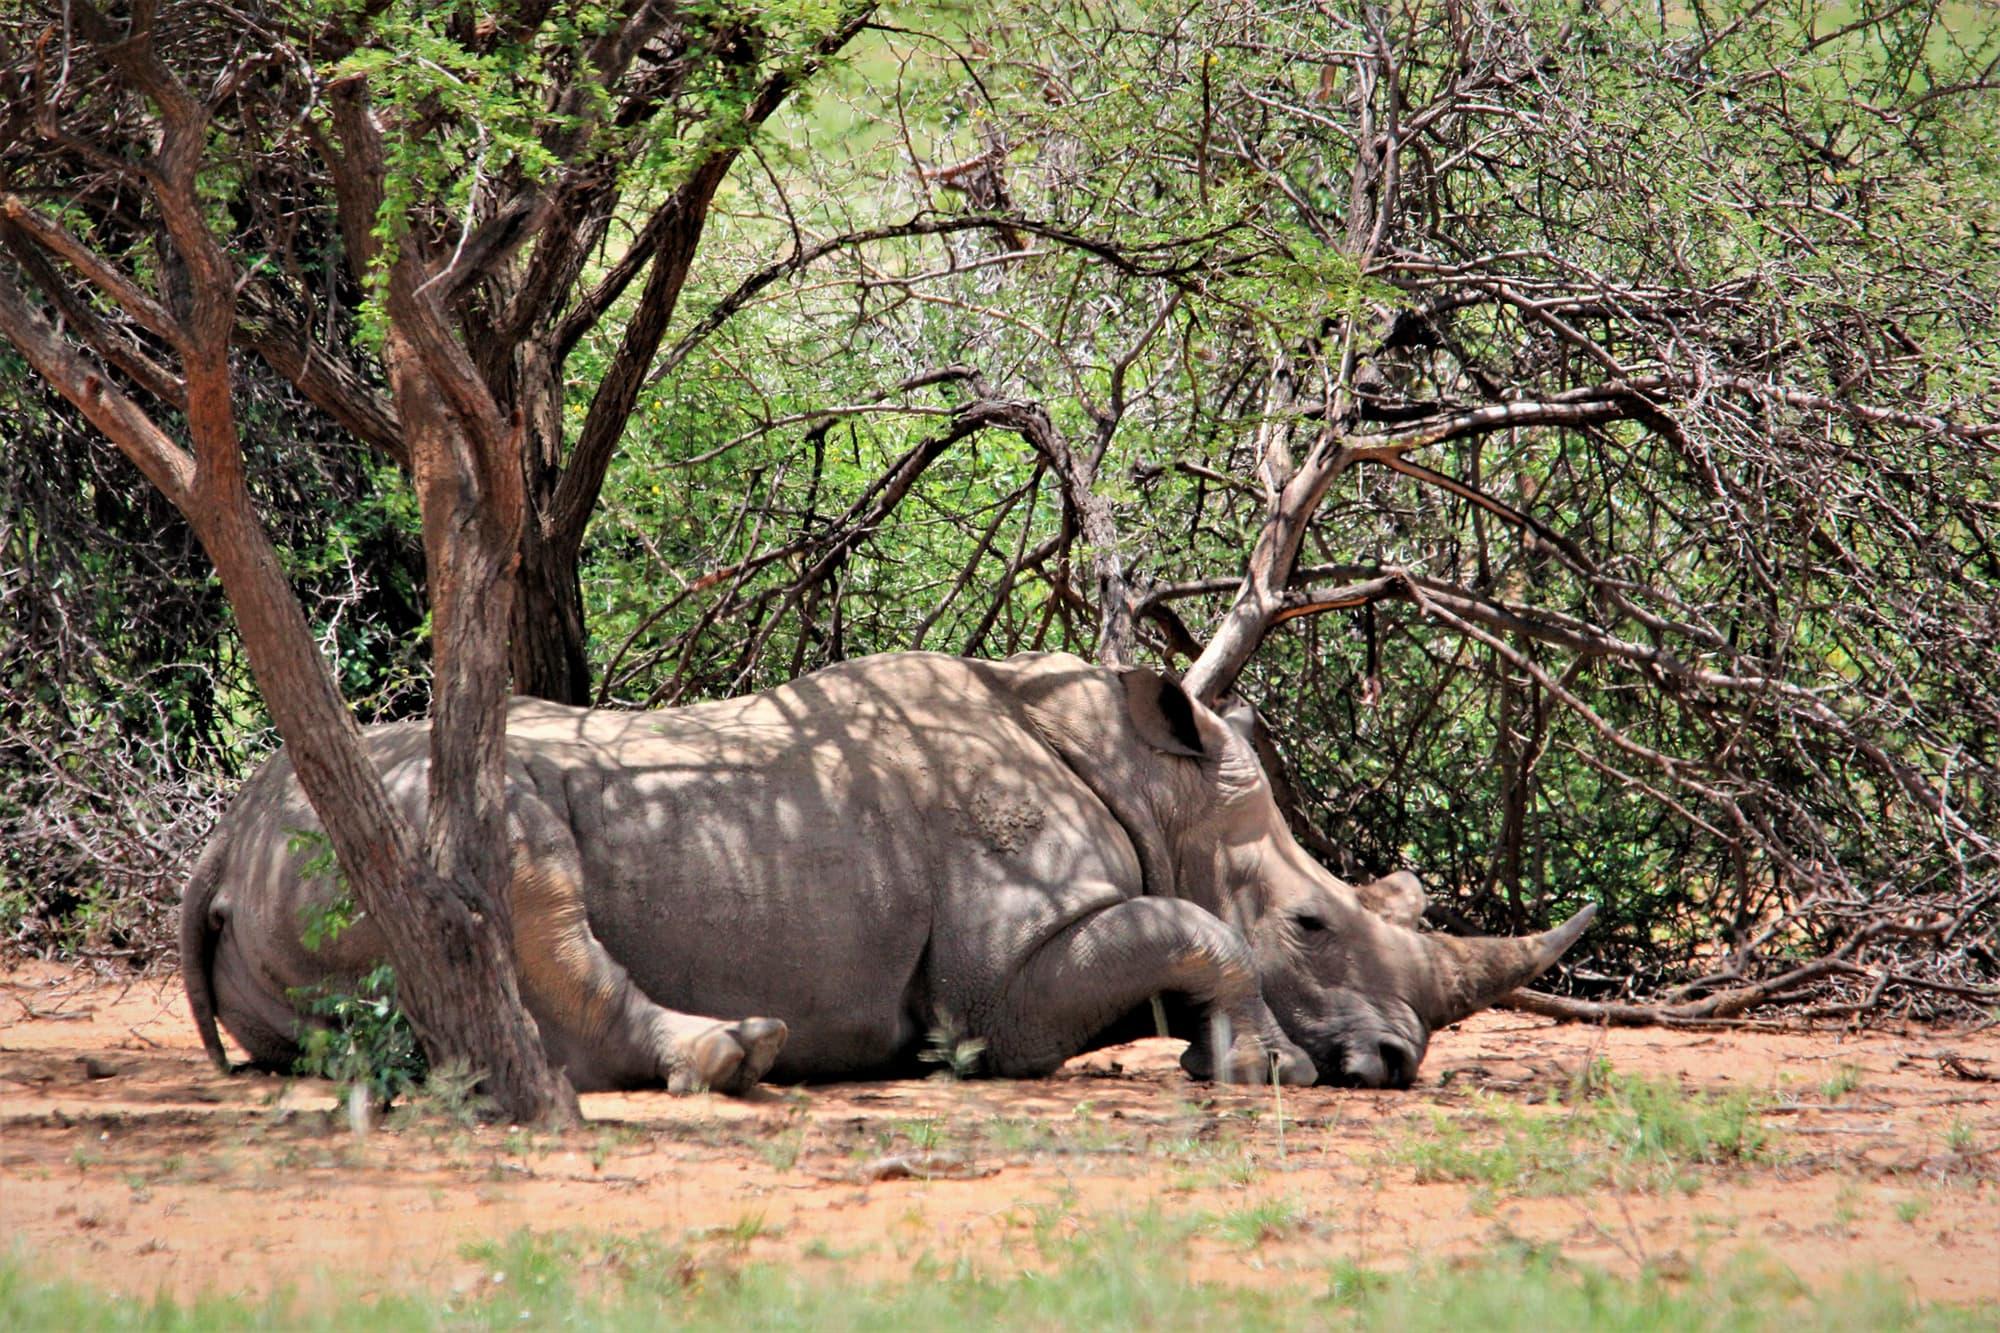 Sudáfrica en Reserva Privada Karongwe o Kapama (Safari Fotográfico) - Sudáfrica- imagen #8